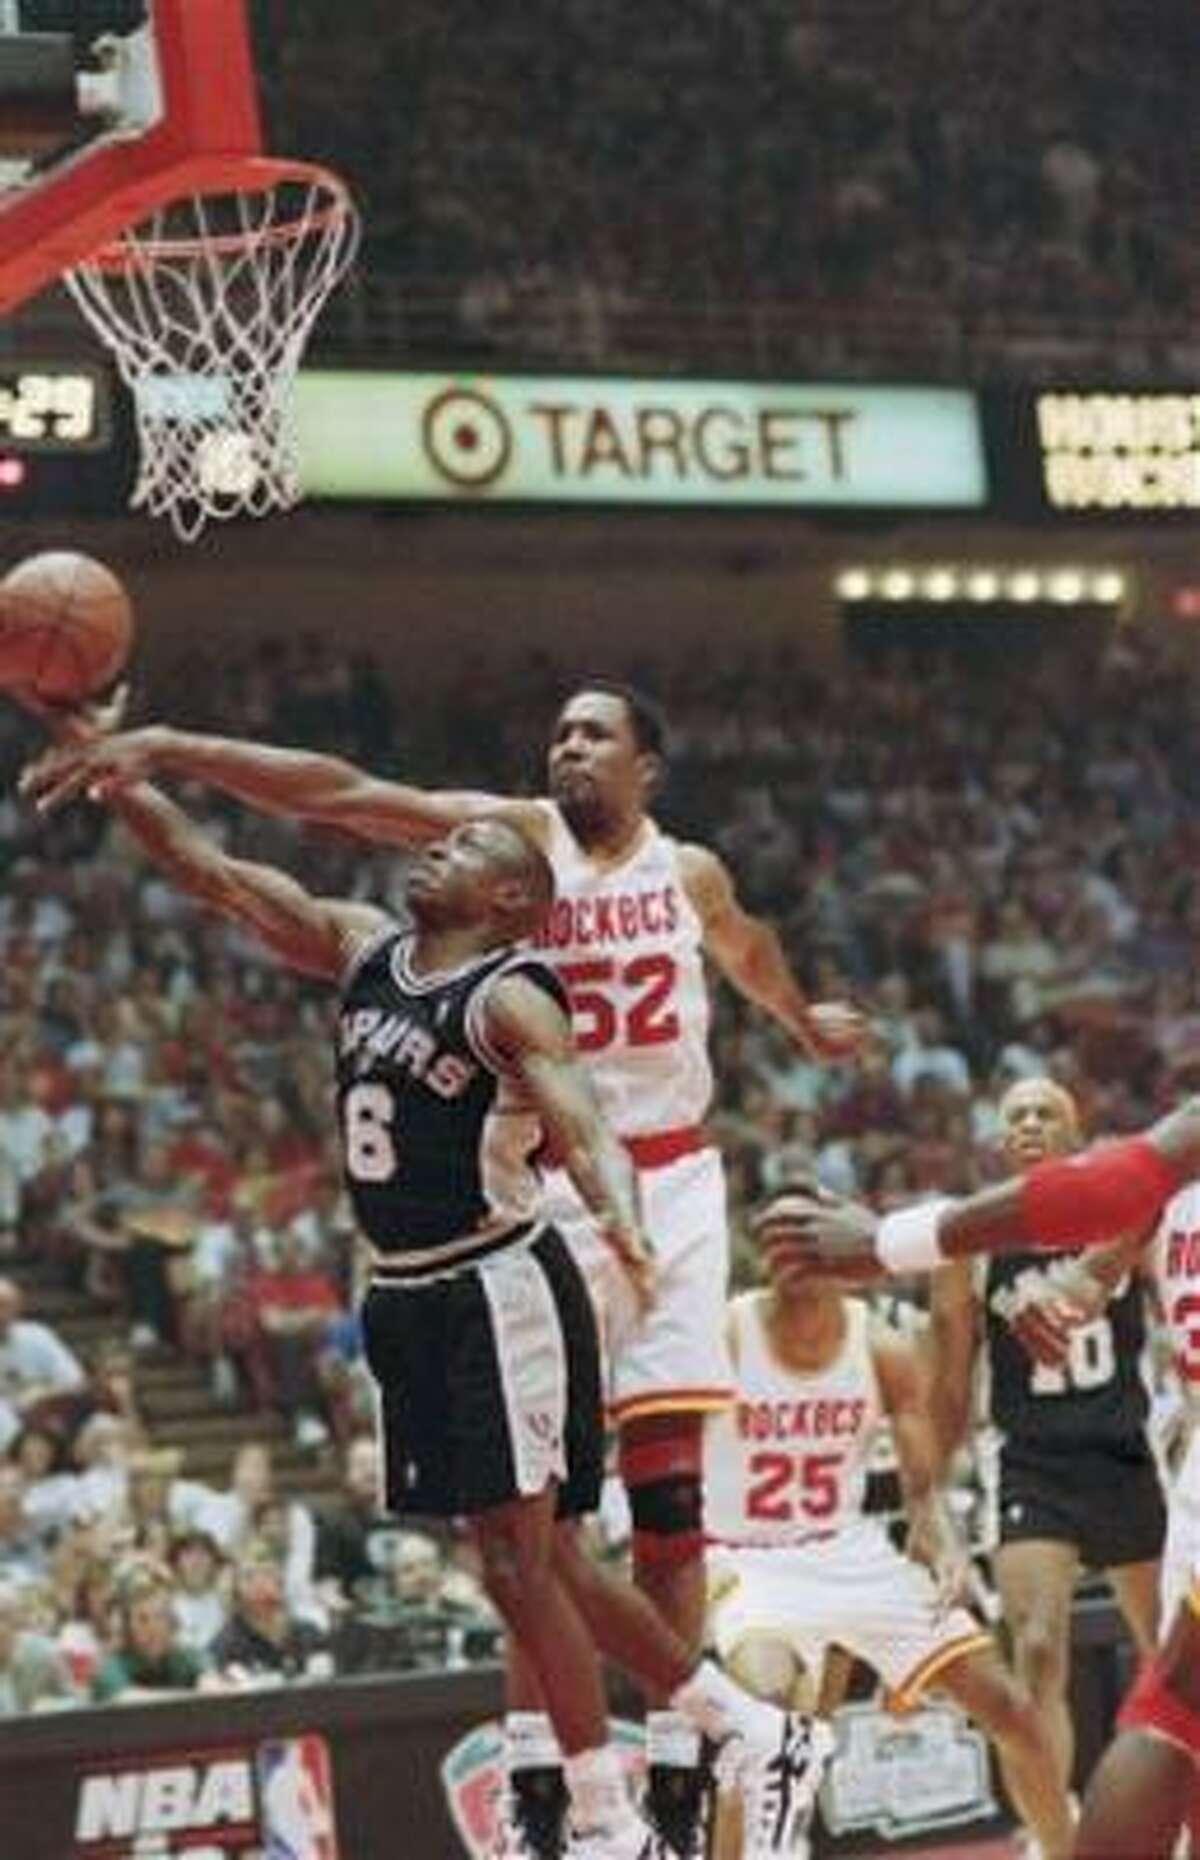 Chucky Brown, forward: Head coach of L.A. Defenders of NBA Development League.